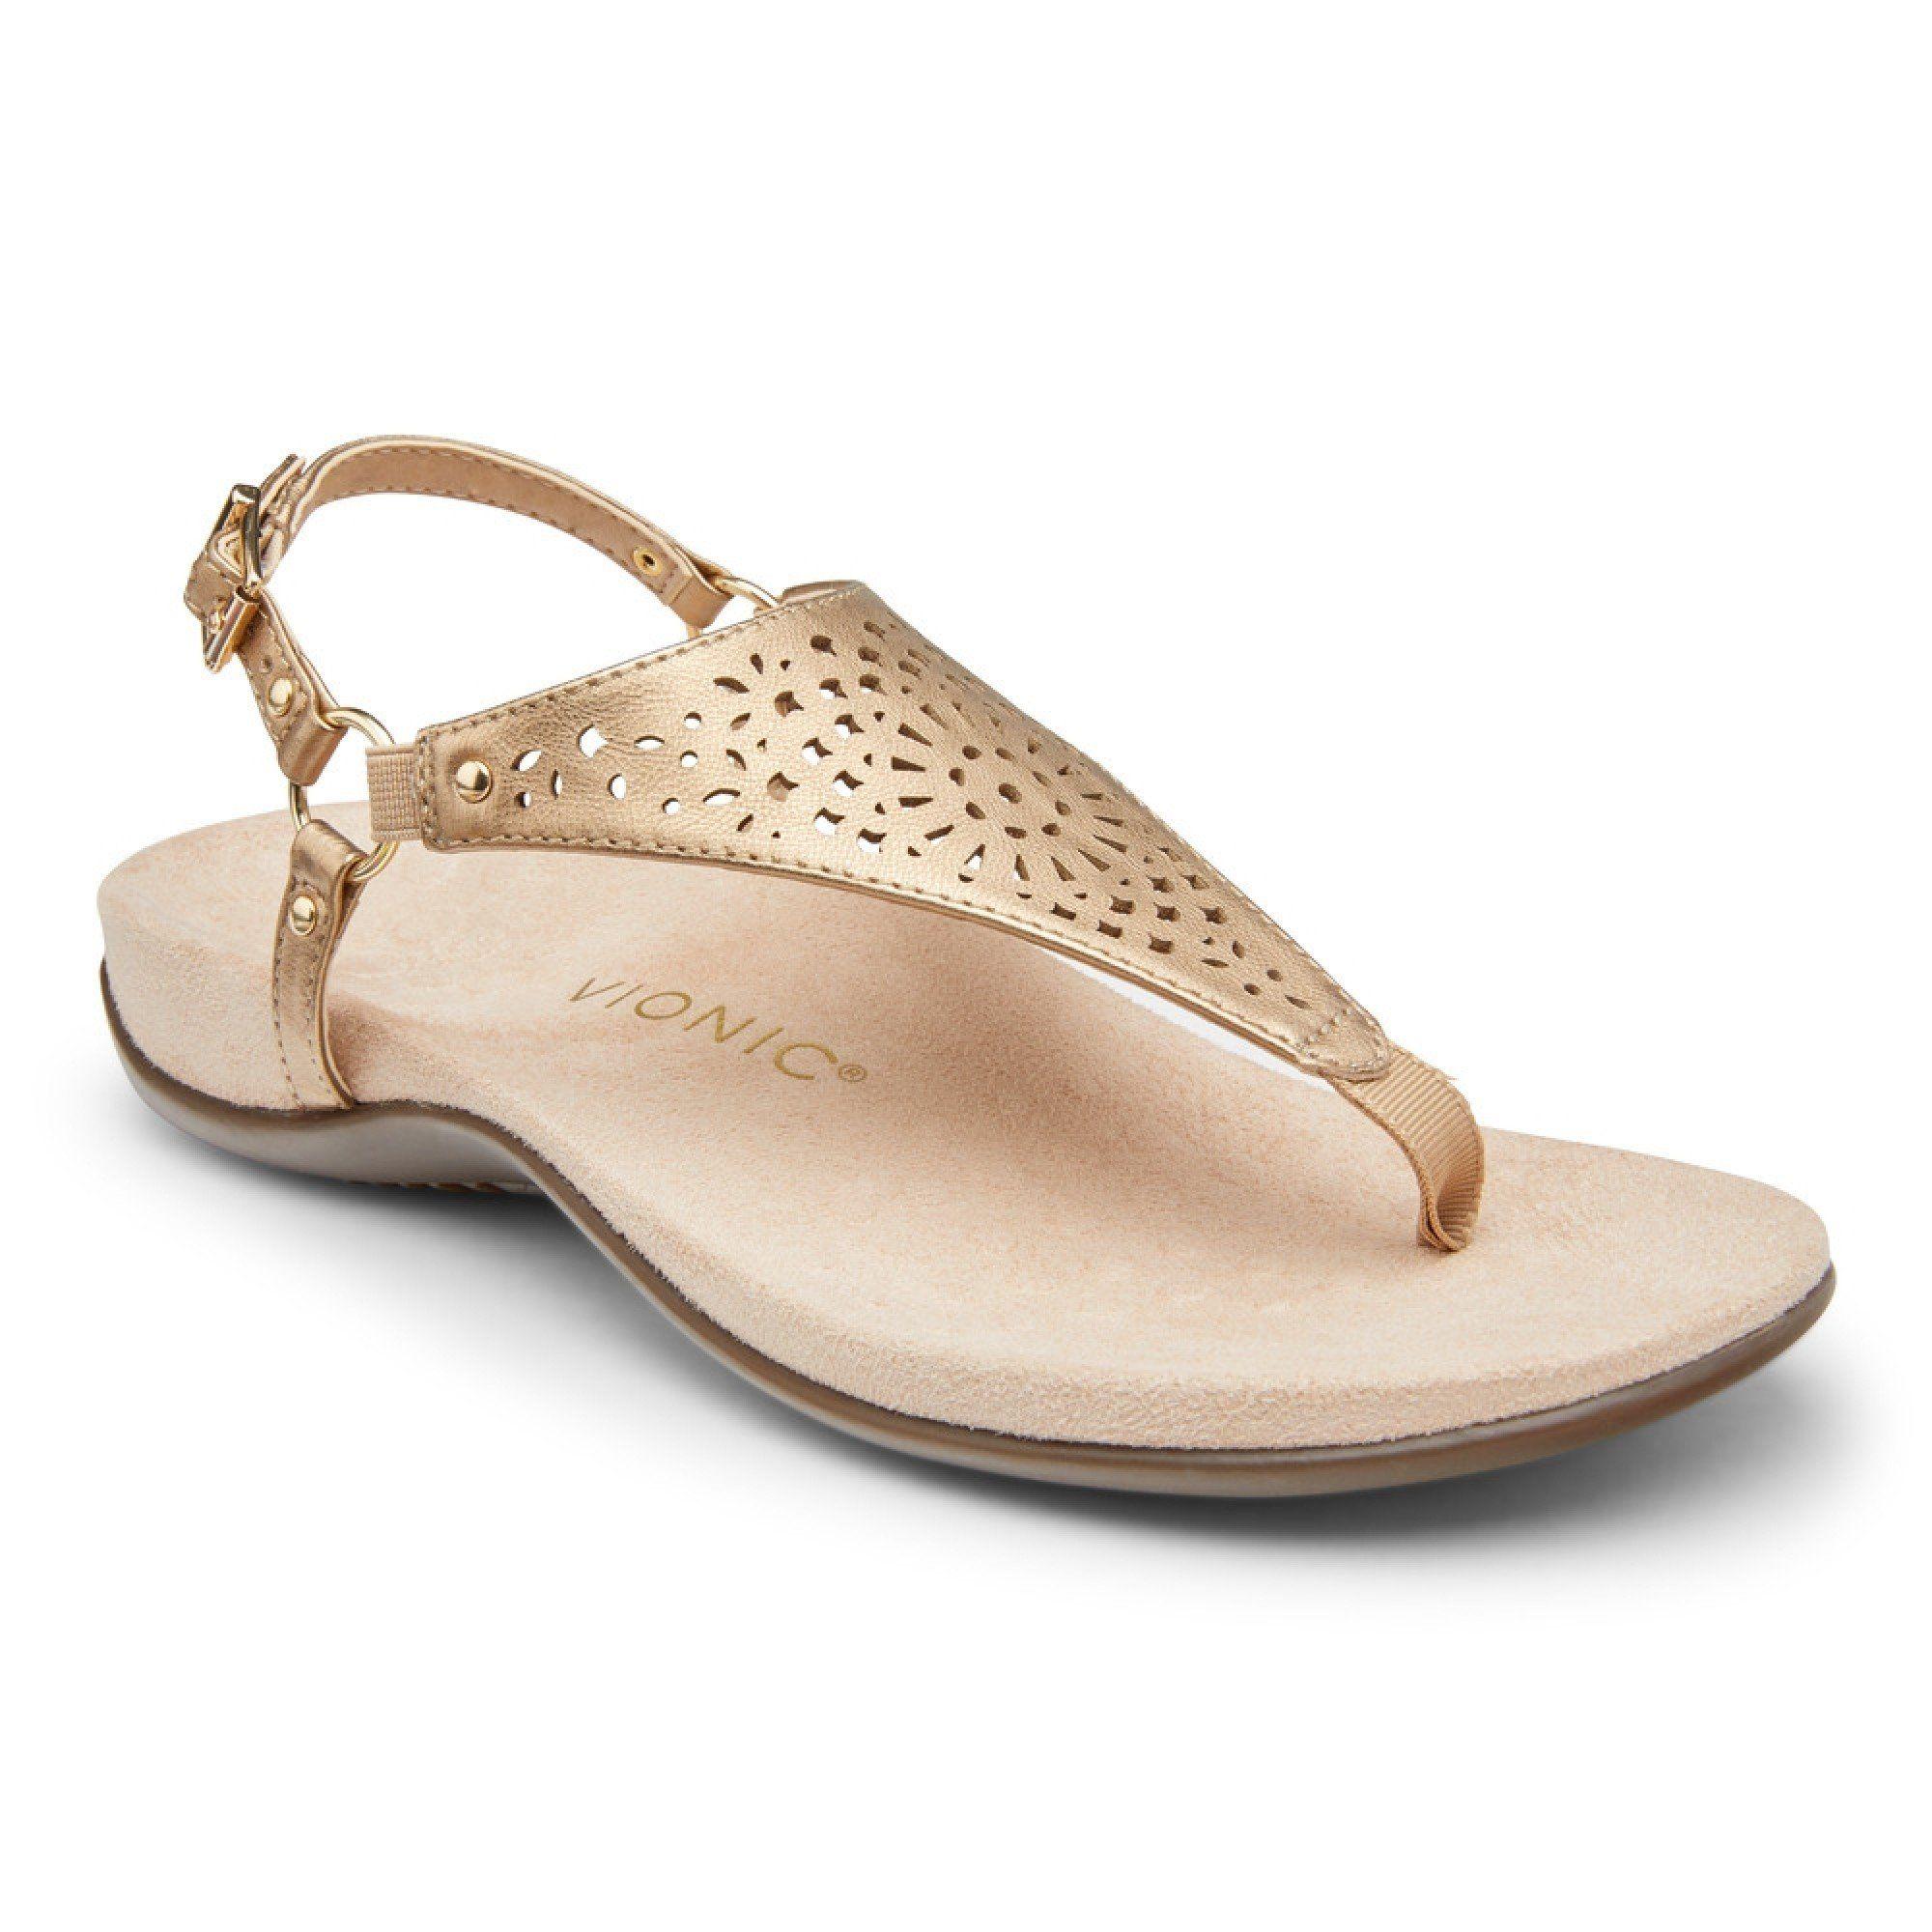 20 Best Summer Sandals 2020 - Flat and